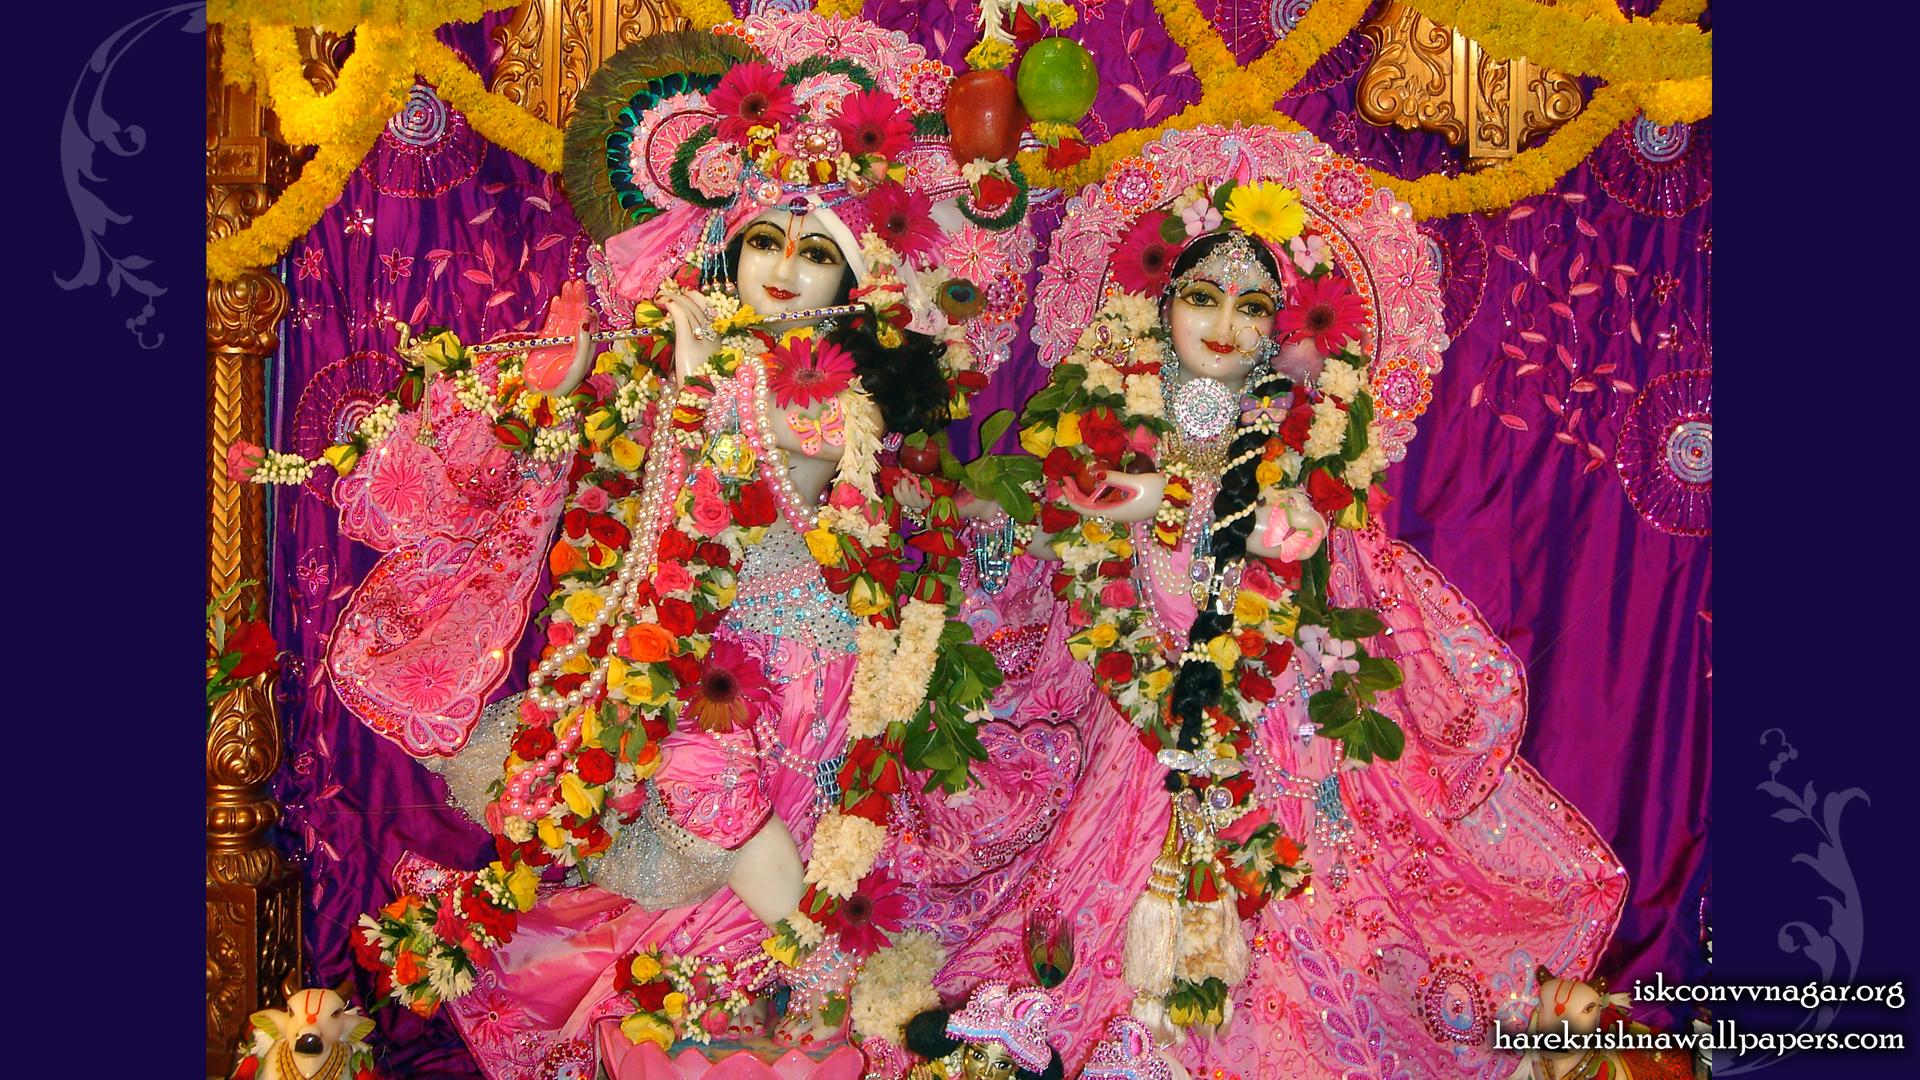 Sri Sri Radha Giridhari Wallpaper (002) Size 1920x1080 Download